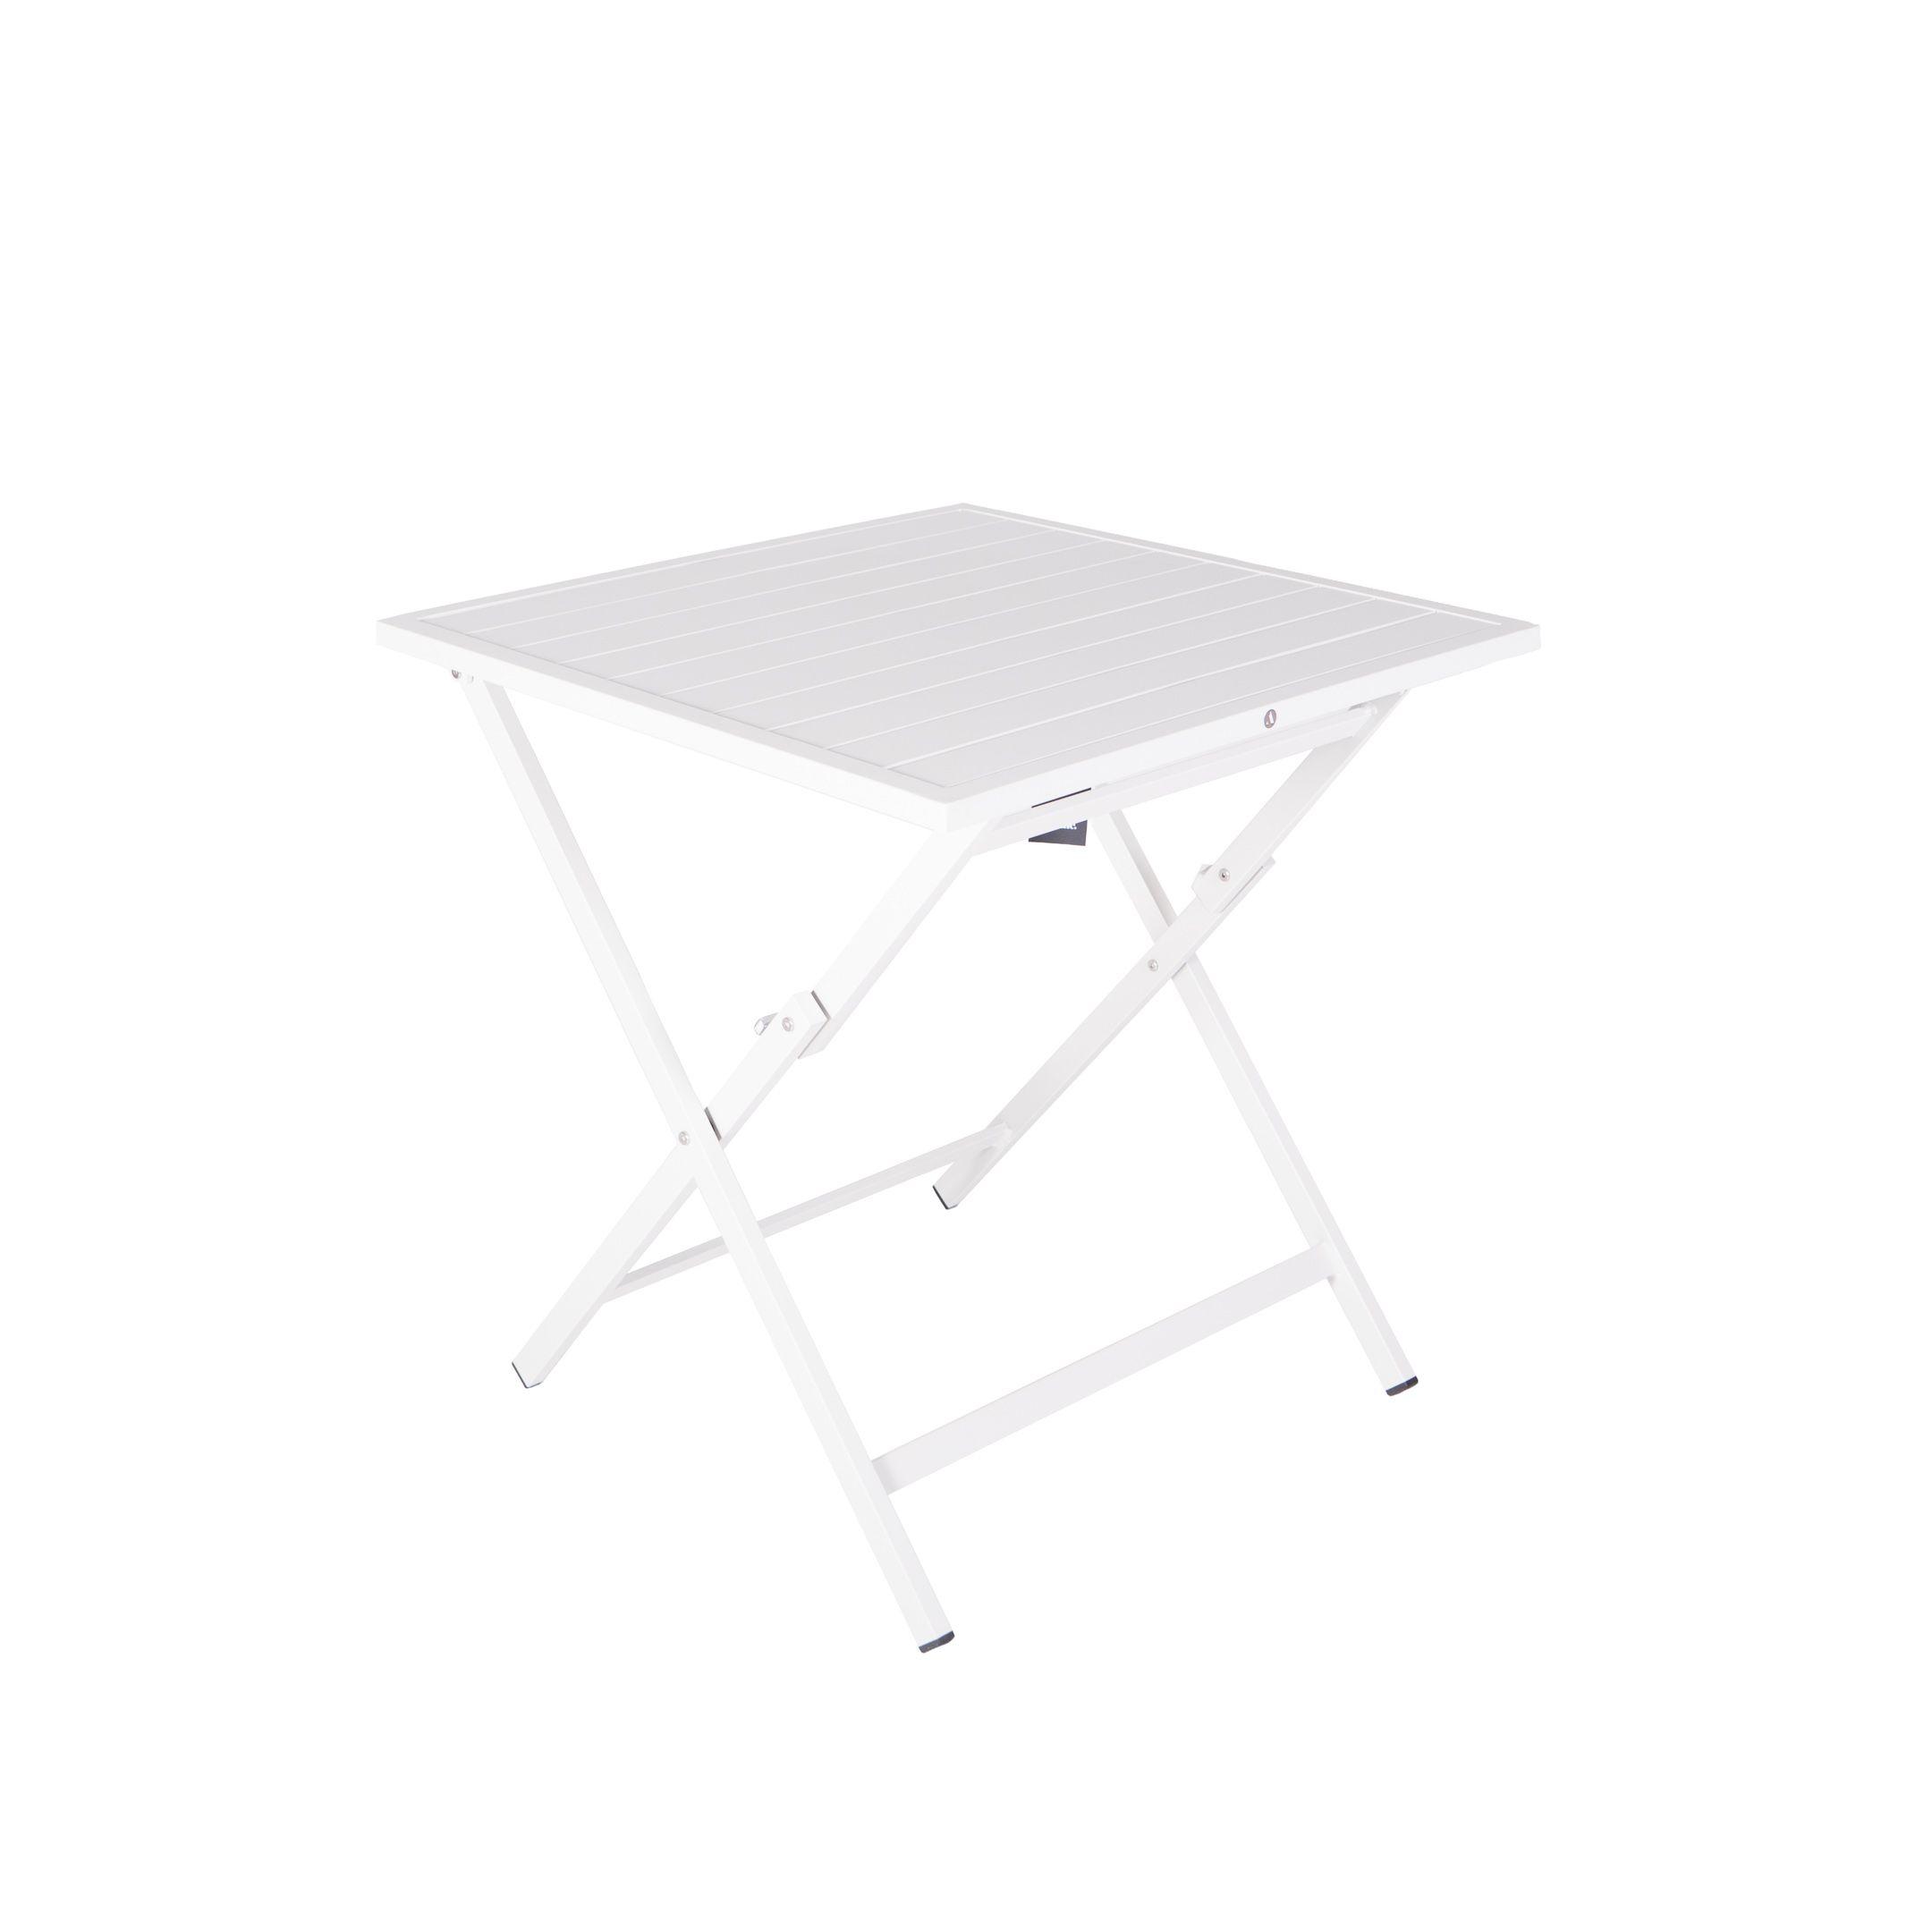 Table de jardin pliante en aluminium